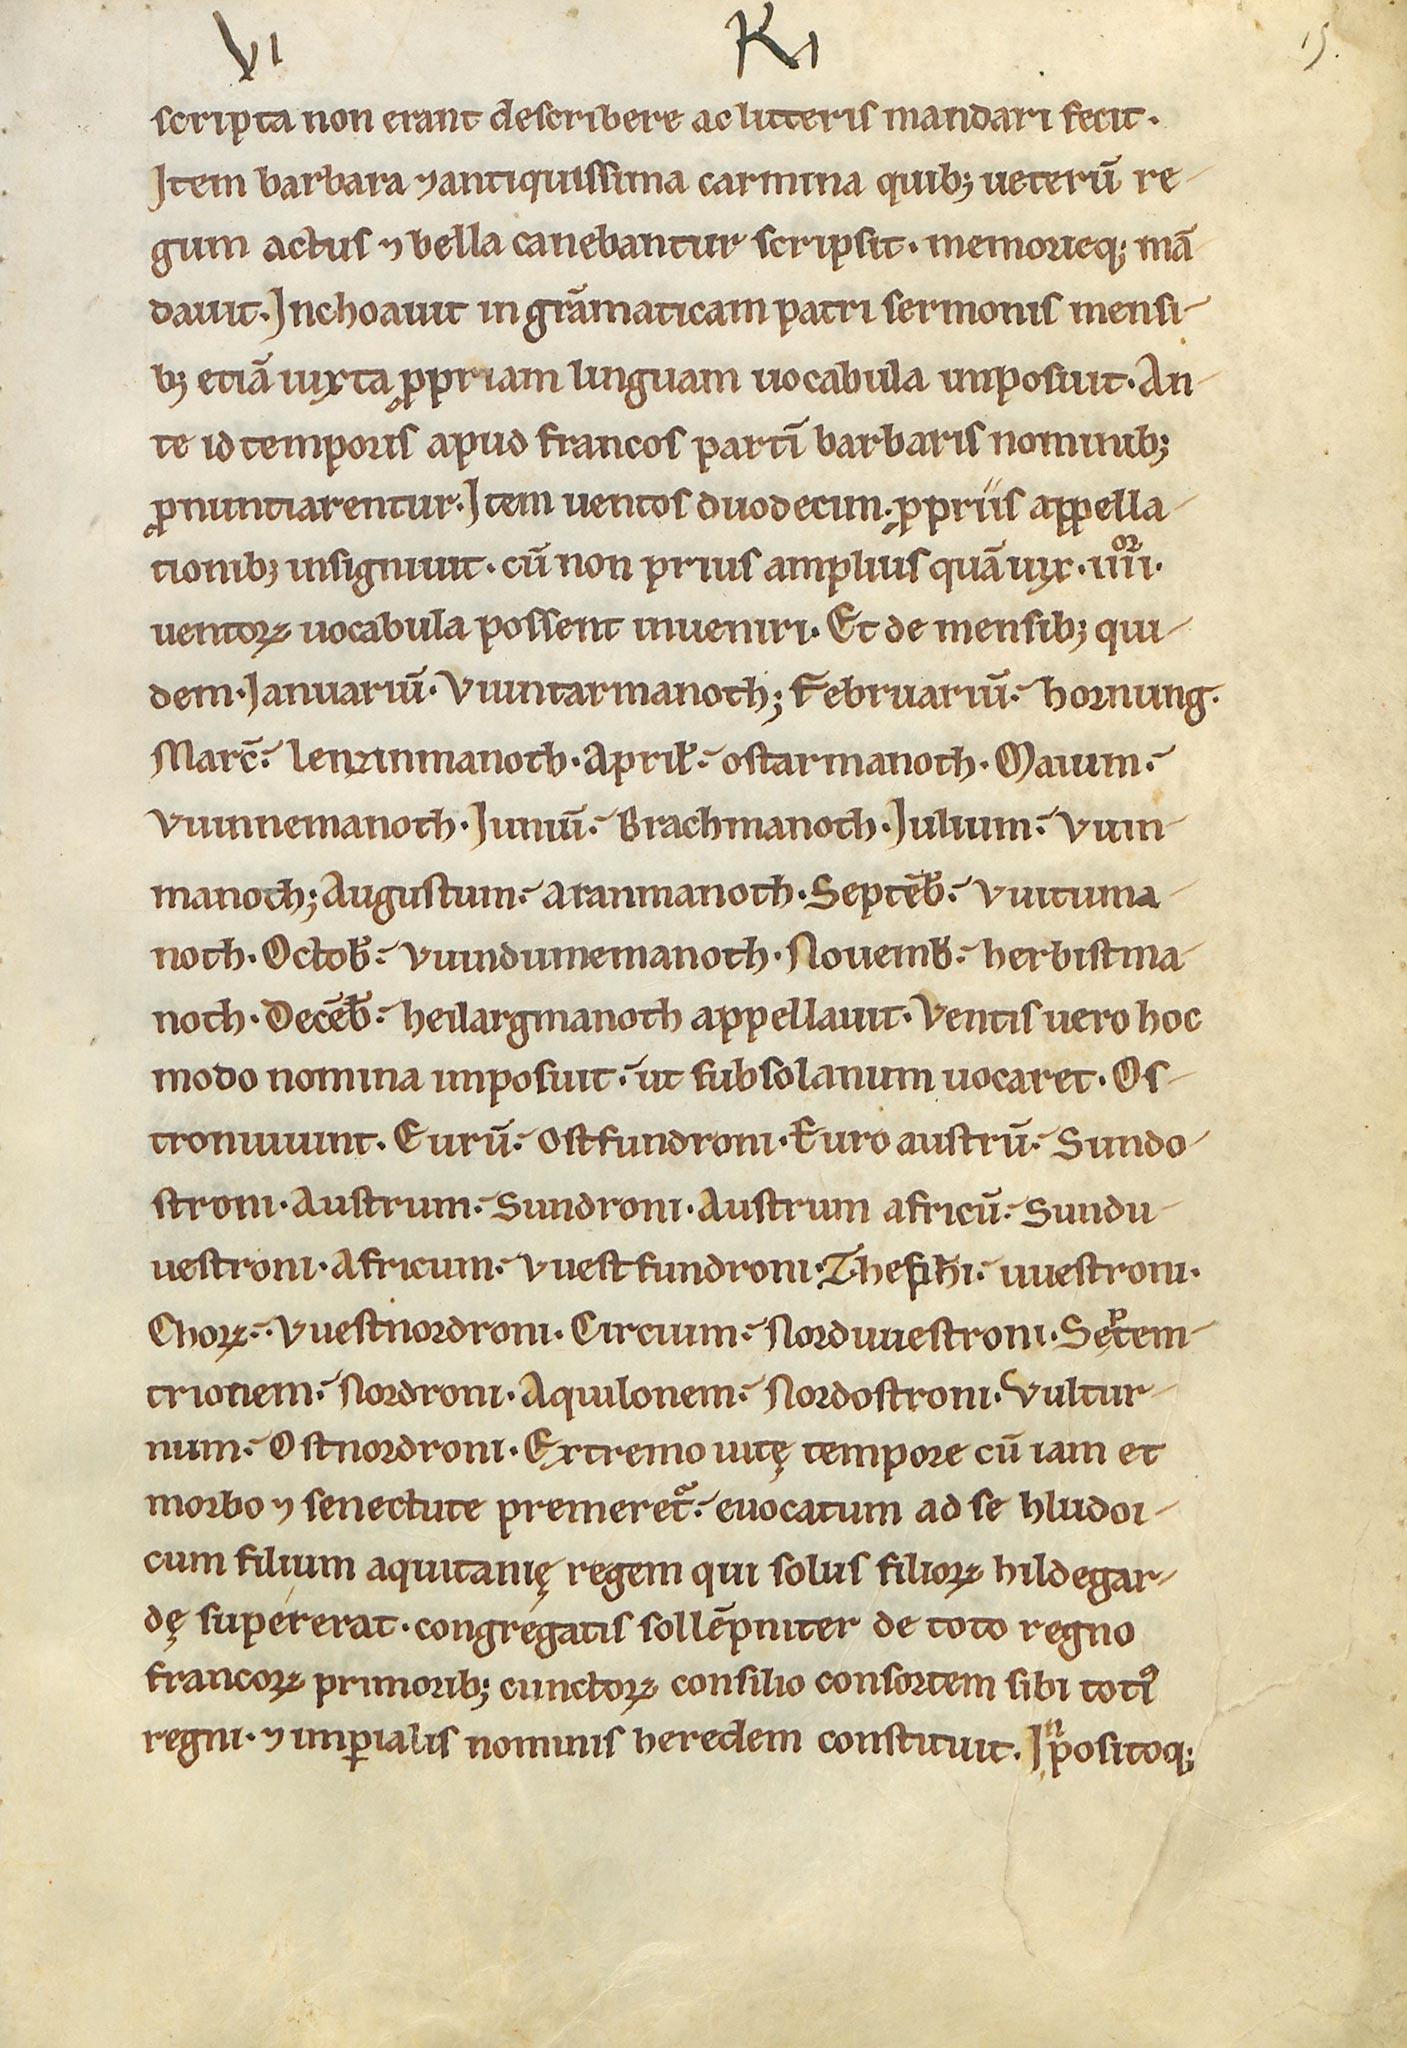 Manuscrit-Vita-Karoli-15r°